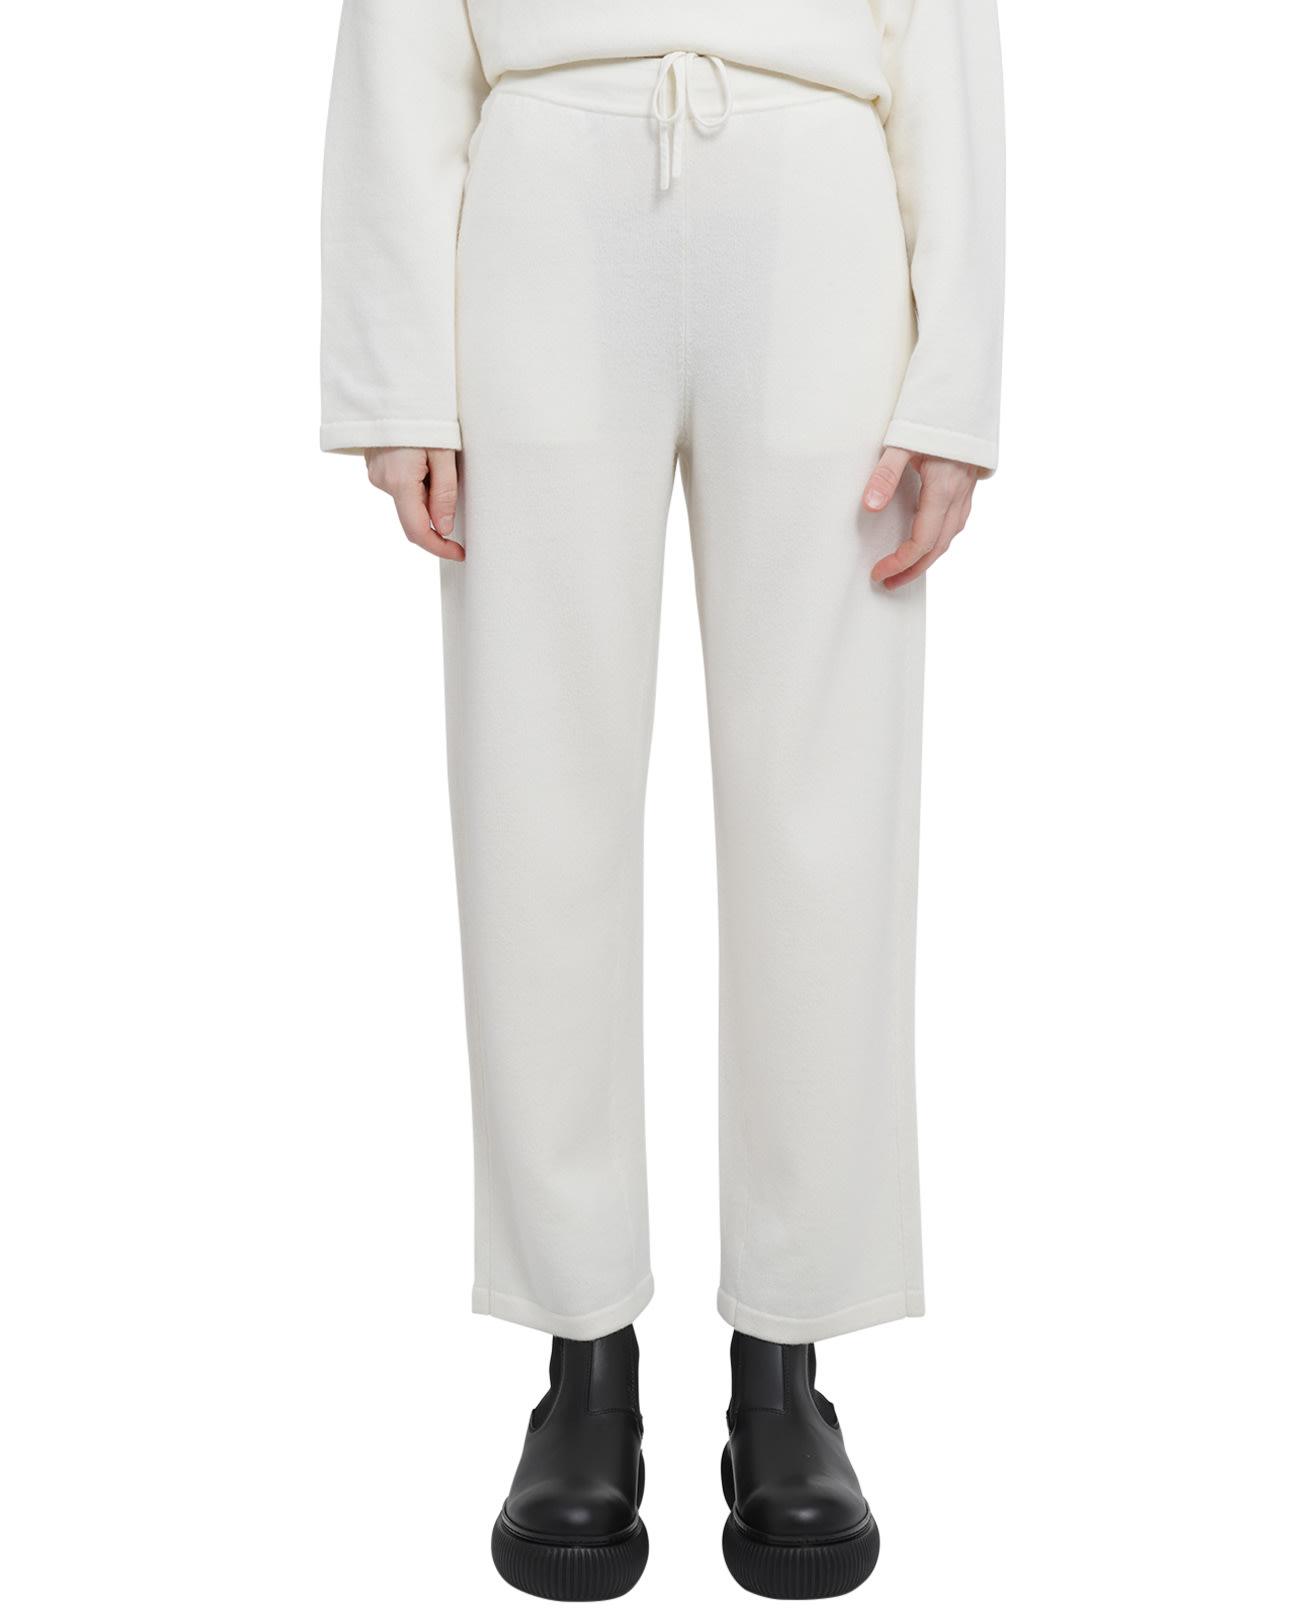 Portofino White Trousers